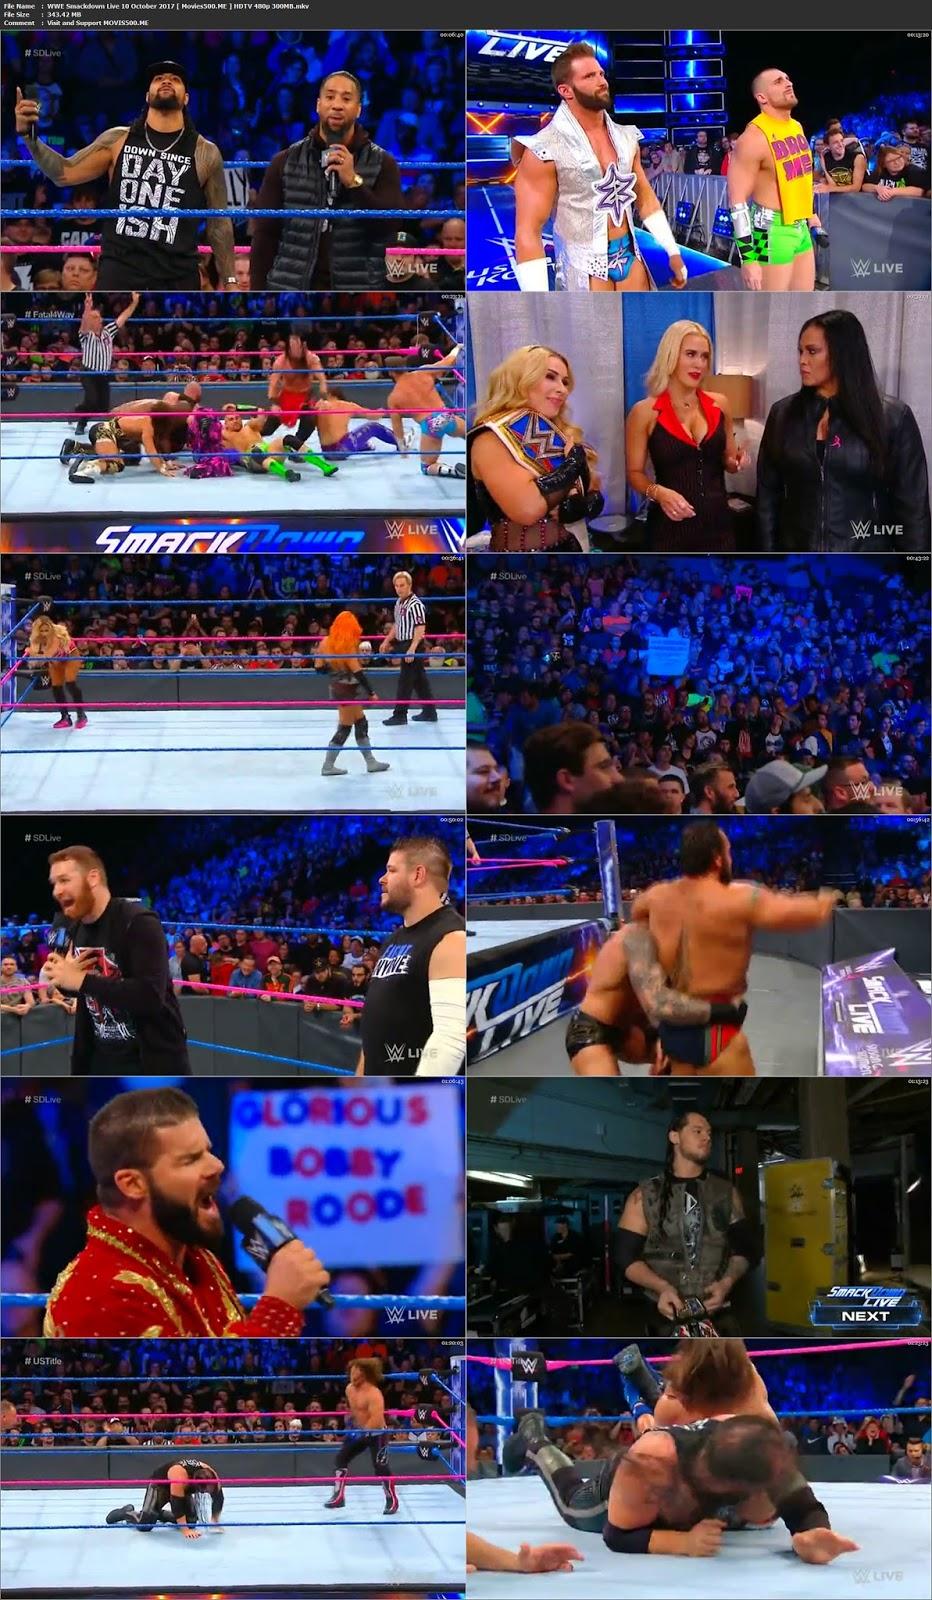 WWE Smackdown Live 10 October 2017 HDTV 343MB Download 480p at createkits.com